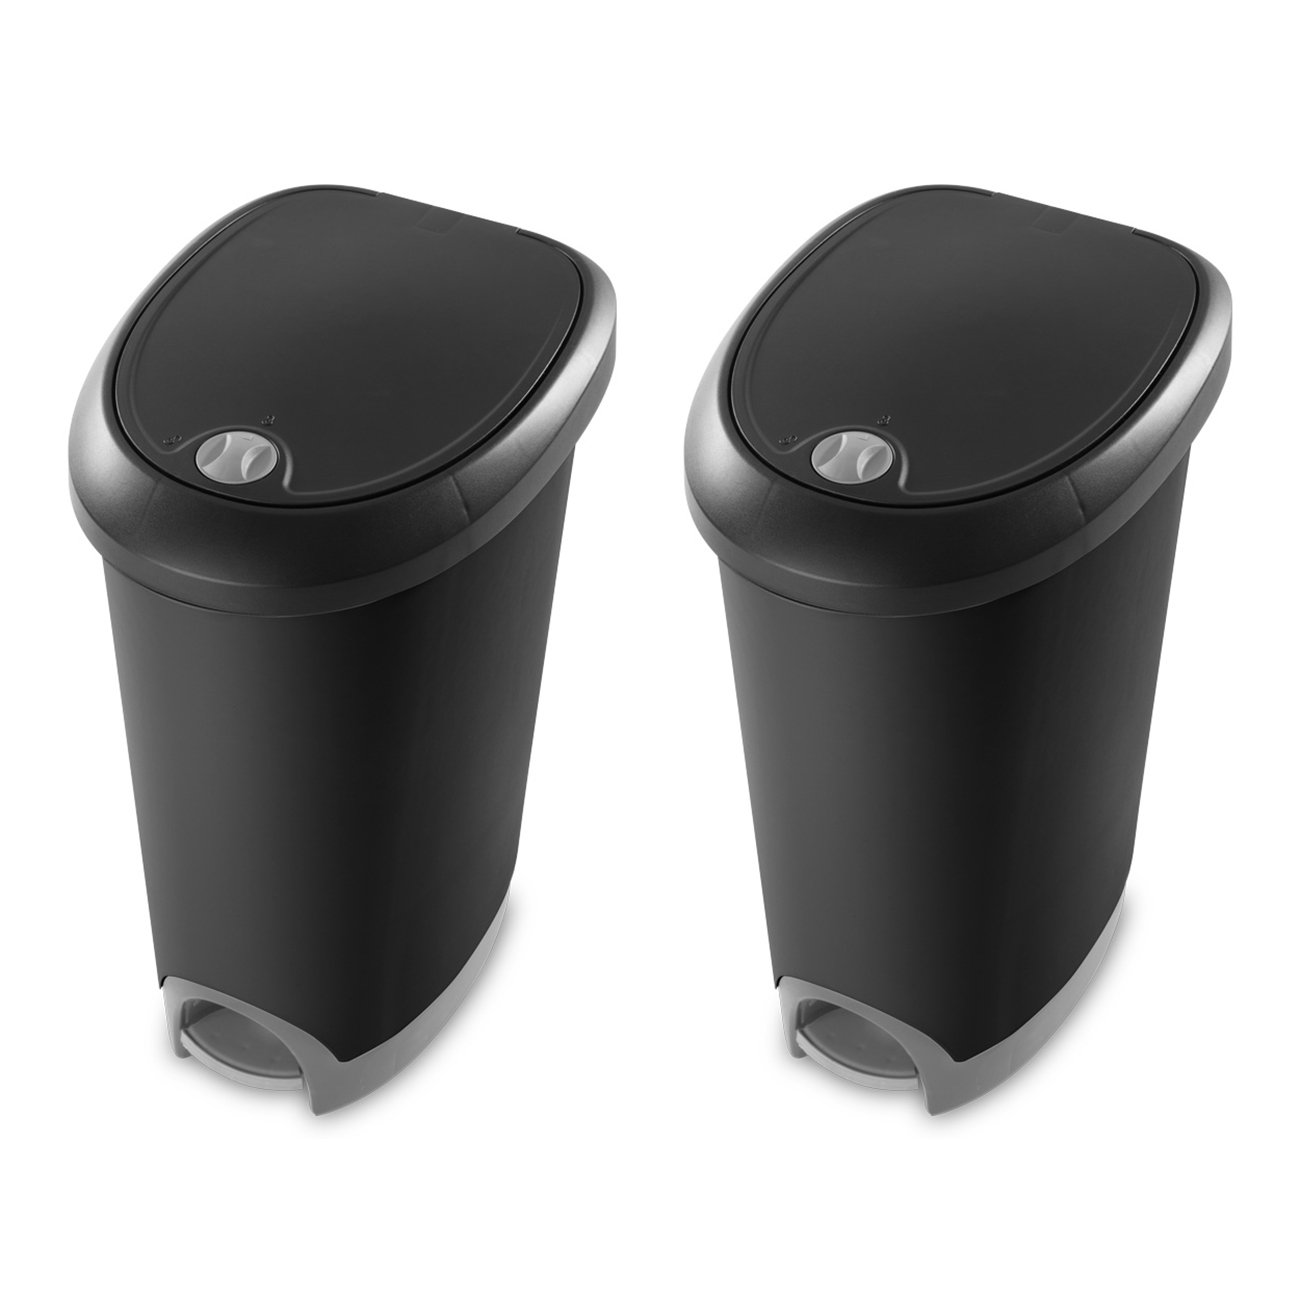 Sterilite 12.6 Gallon Locking StepOn Wastebasket, Black (2 Pack)   10739002